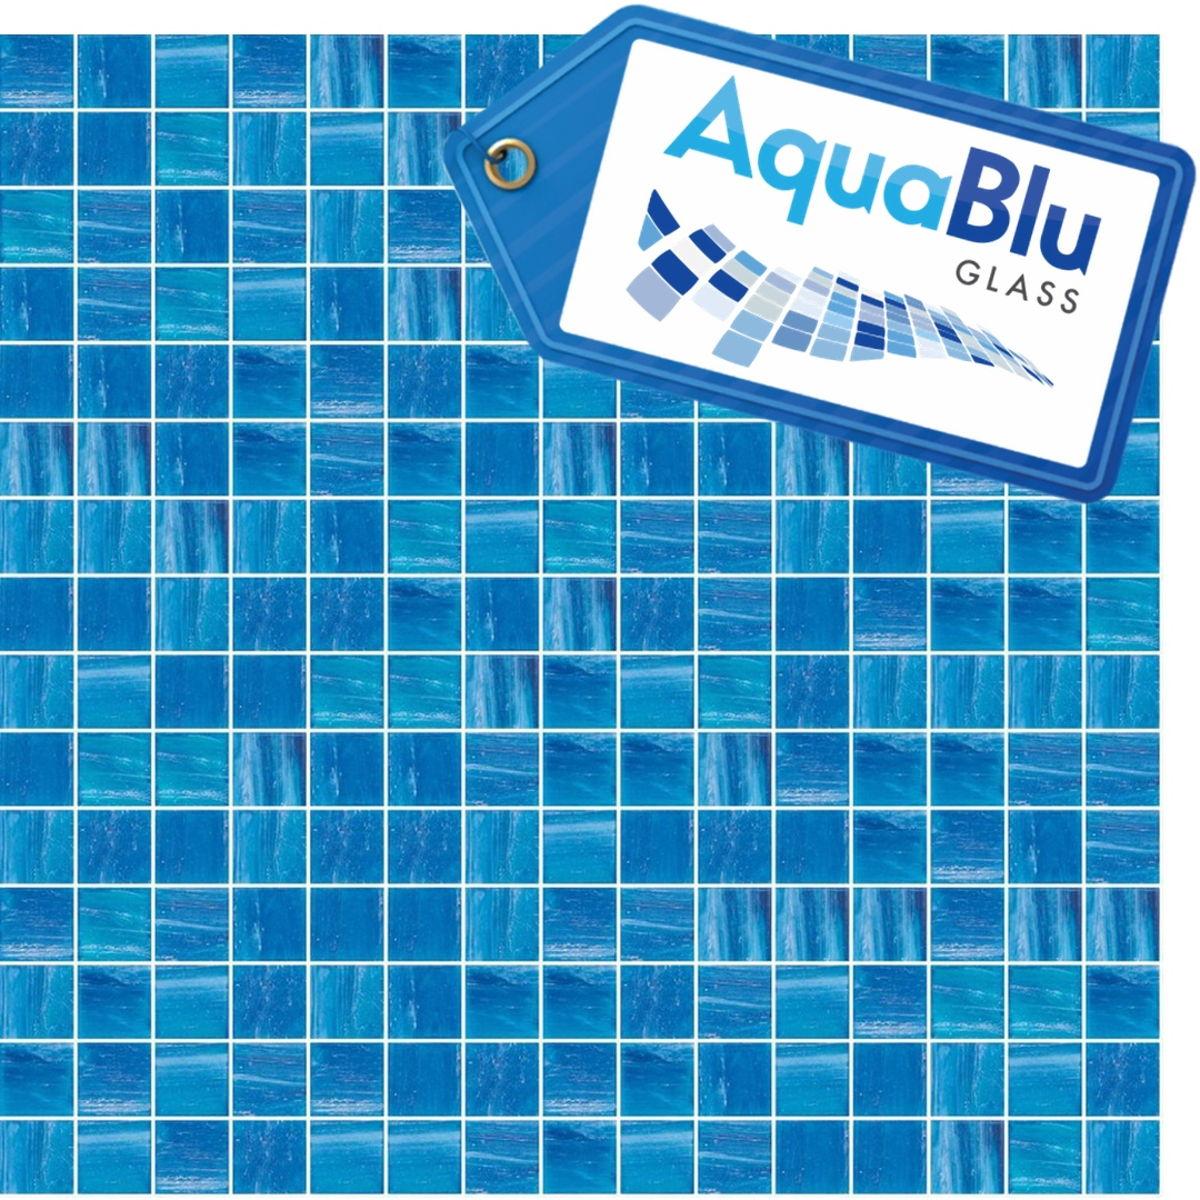 Buy Mosaic Glass Tile Online  Shop By Brand  Aquablu Mosaics